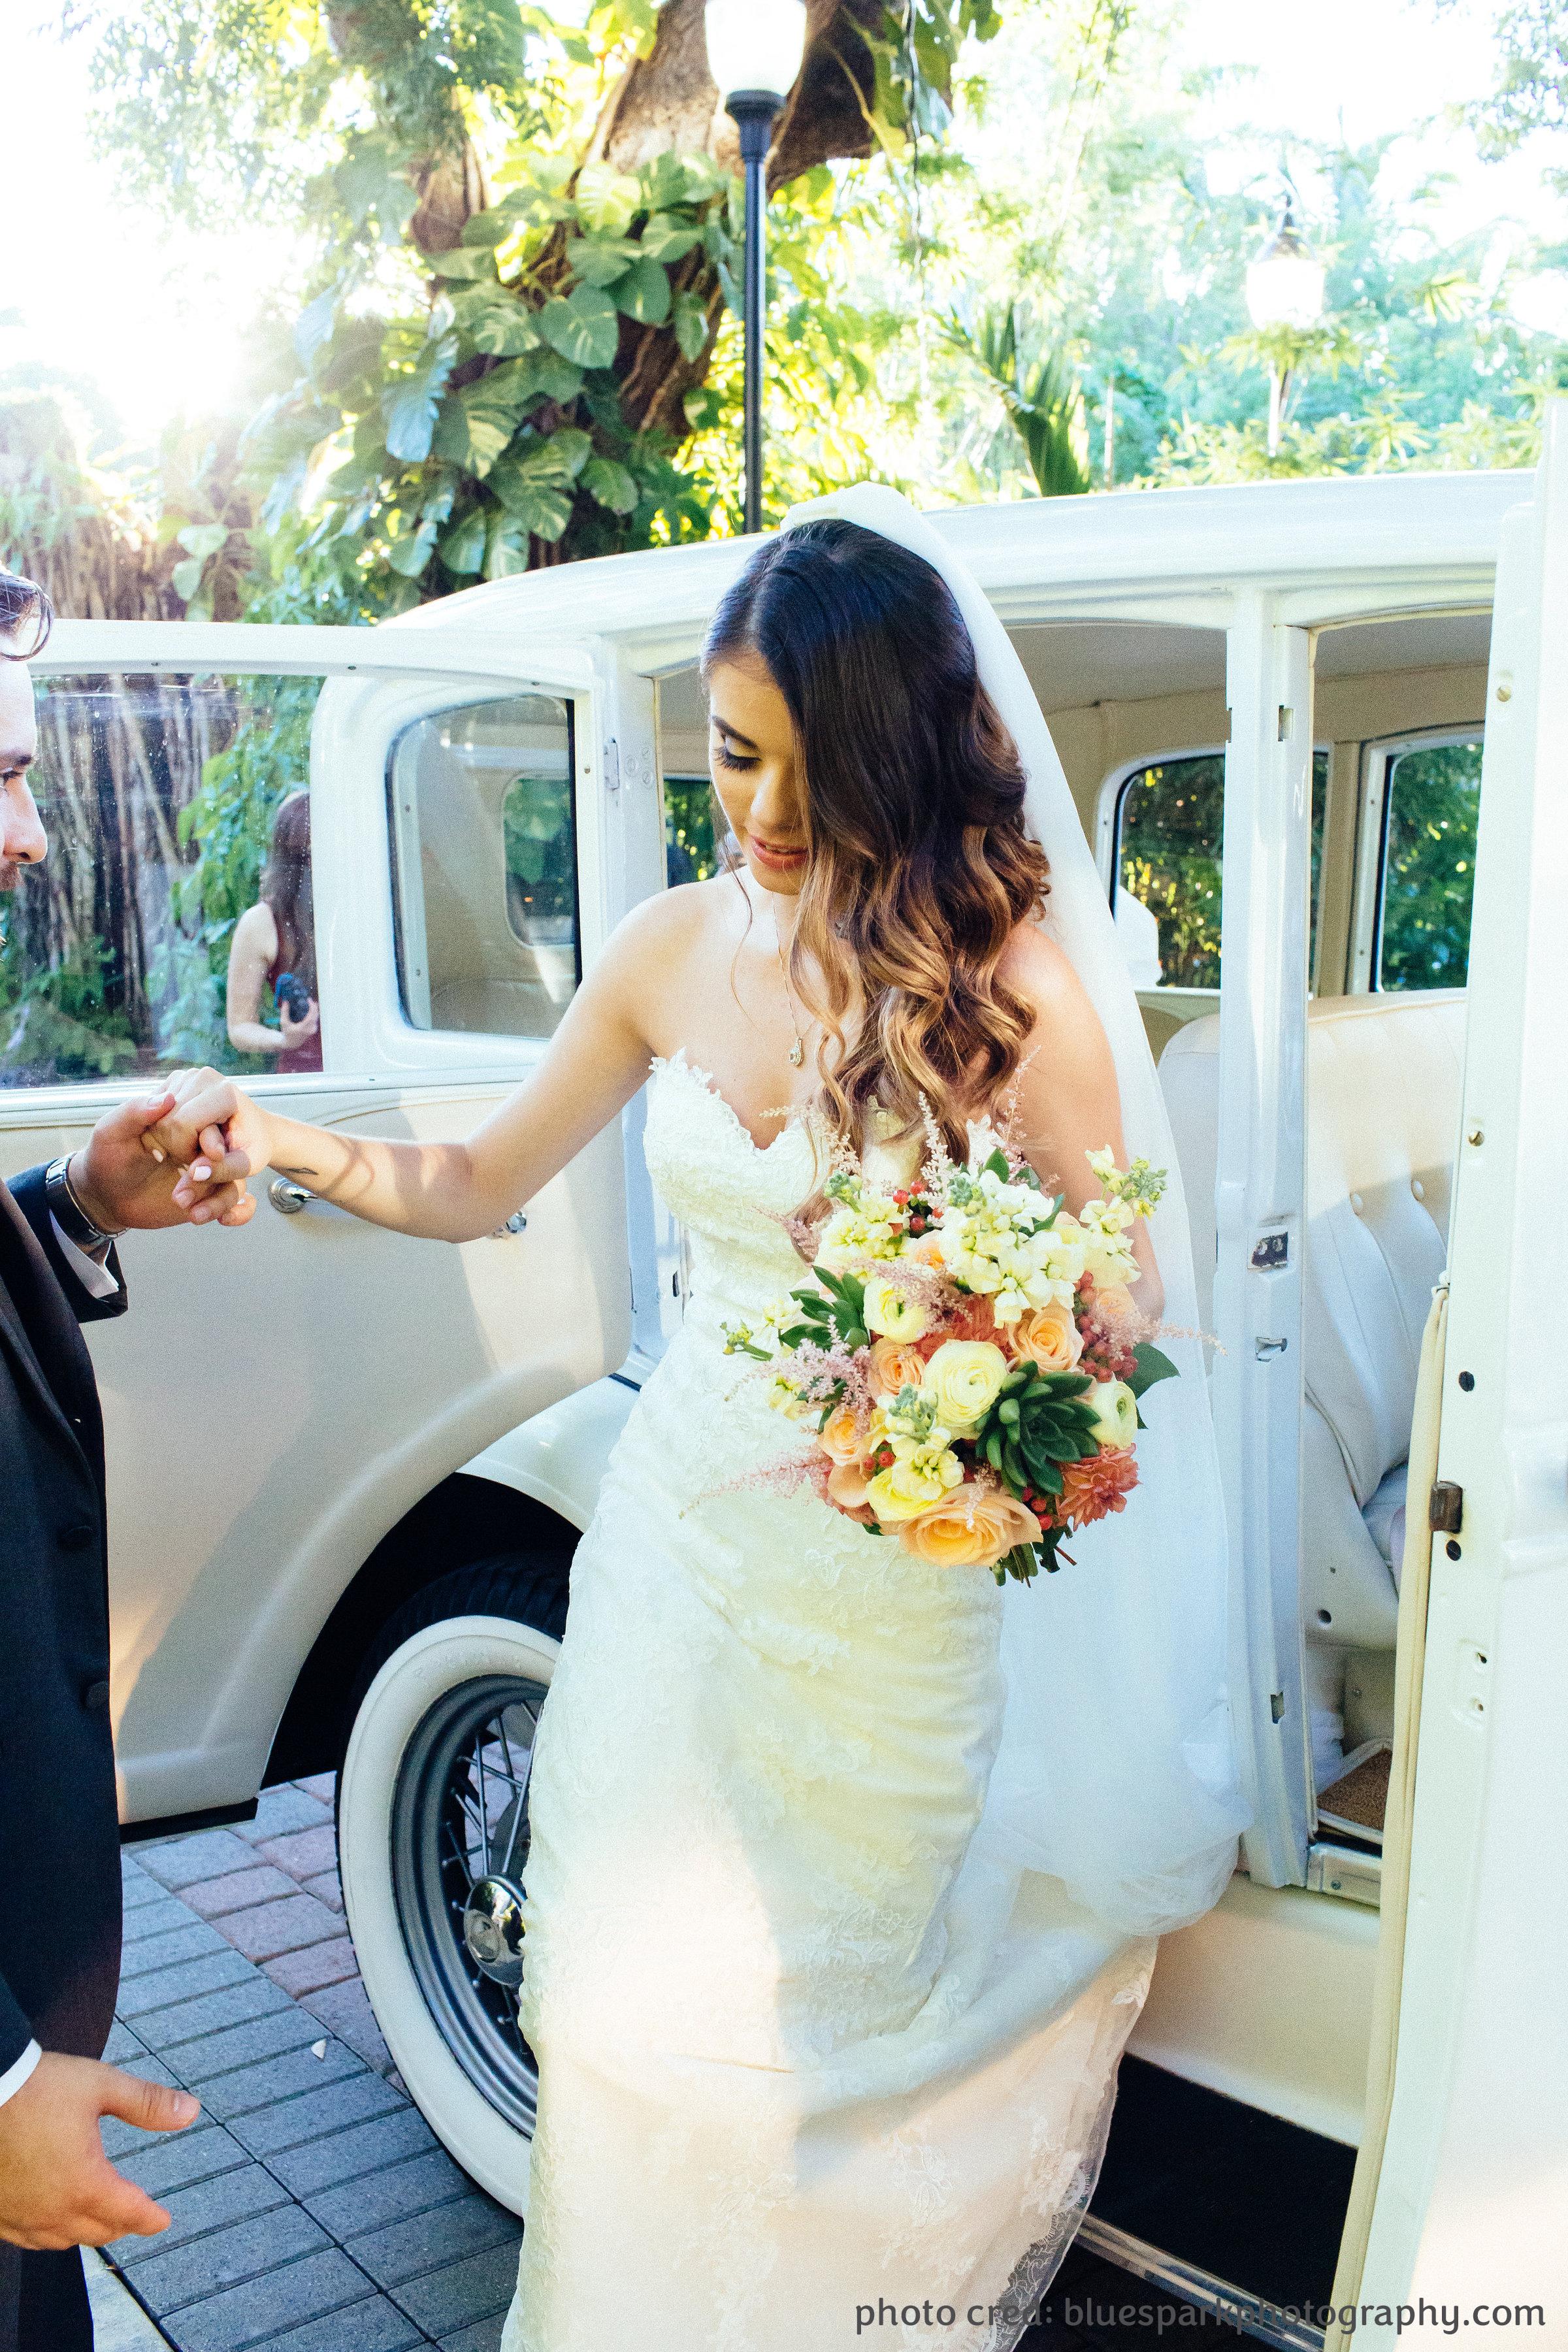 20160916_Wedding_ClaudiaCamargo-373_CREDIT.jpg